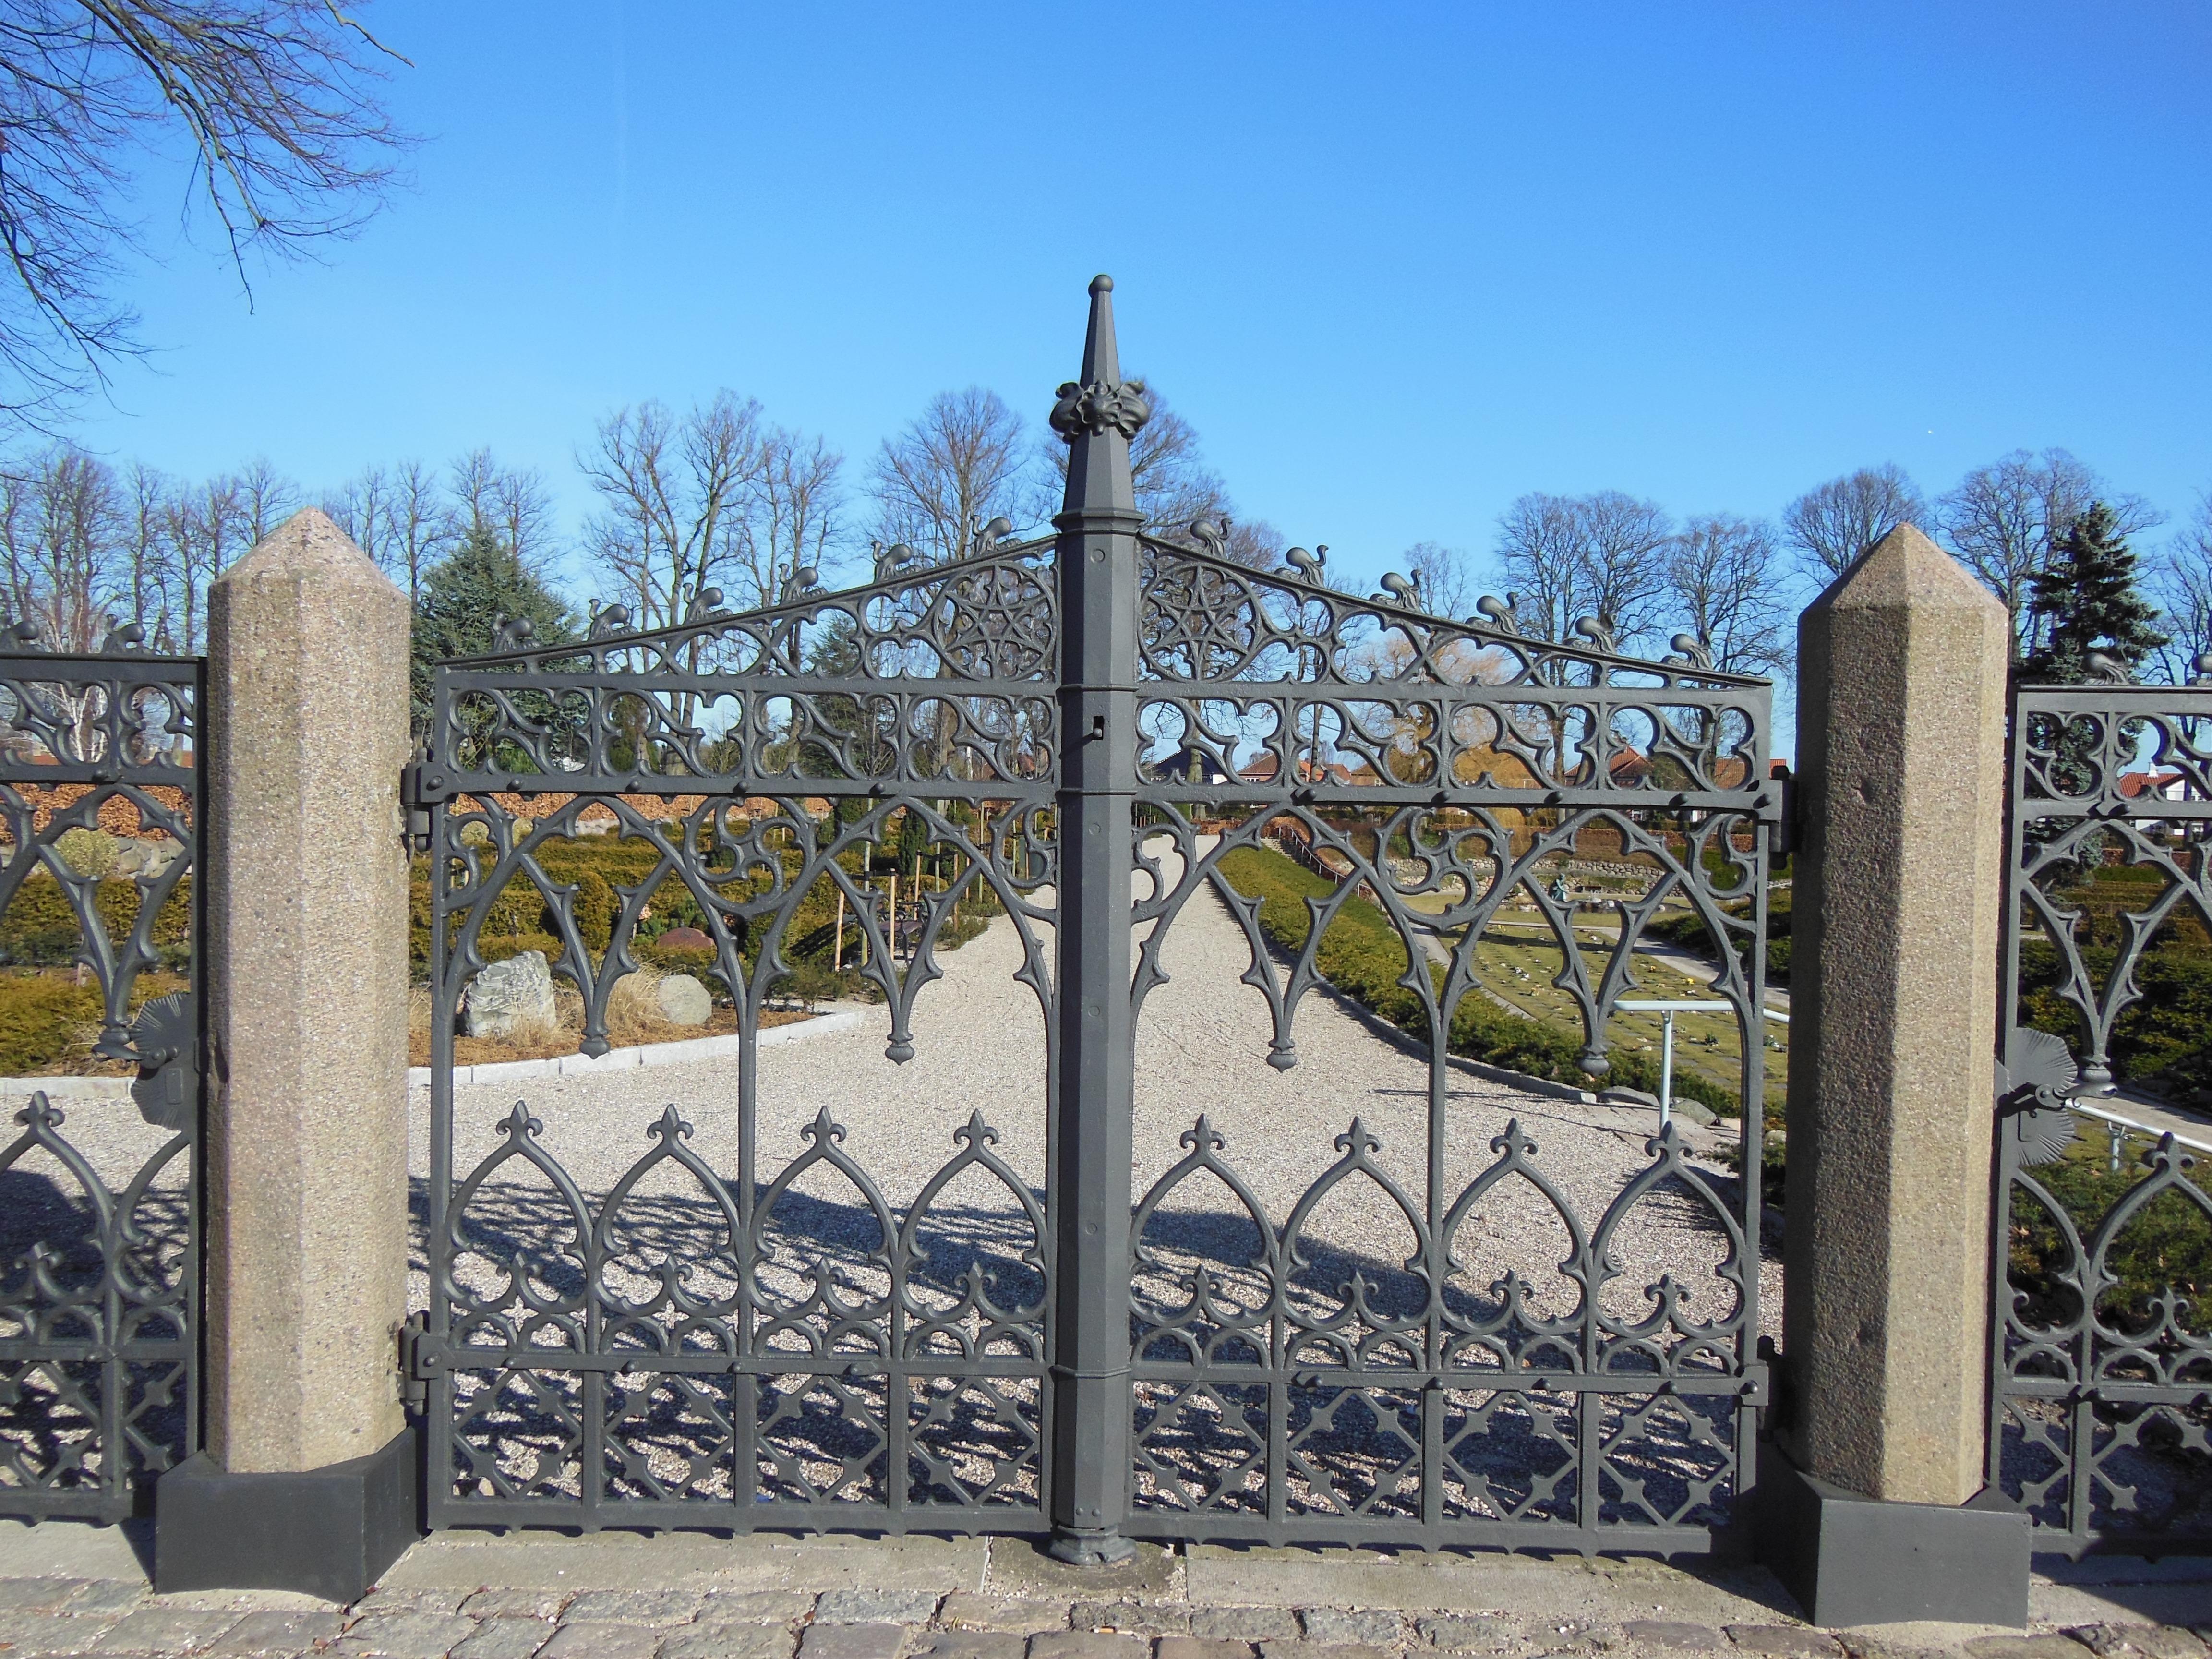 Kostenlose foto Zaun alt Bogen Metall Tor blauer Himmel